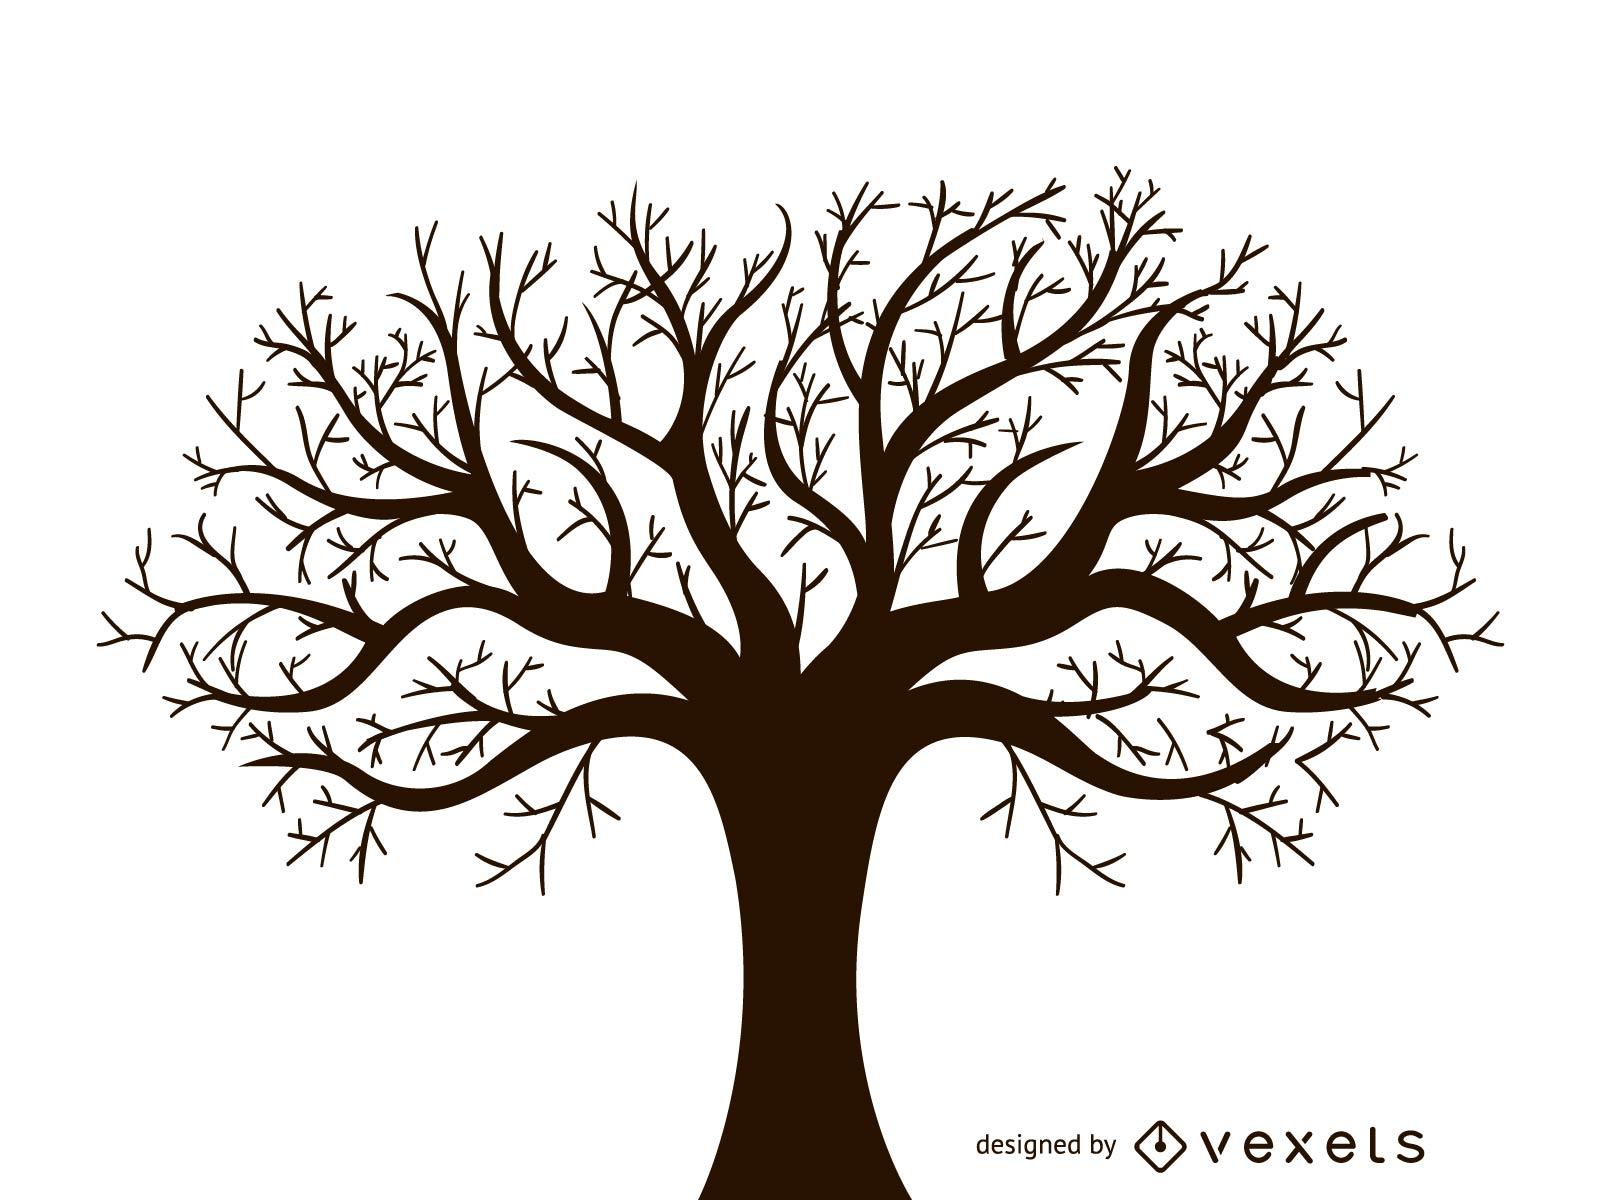 Leafless Autumn Tree Design Vector - Vector download